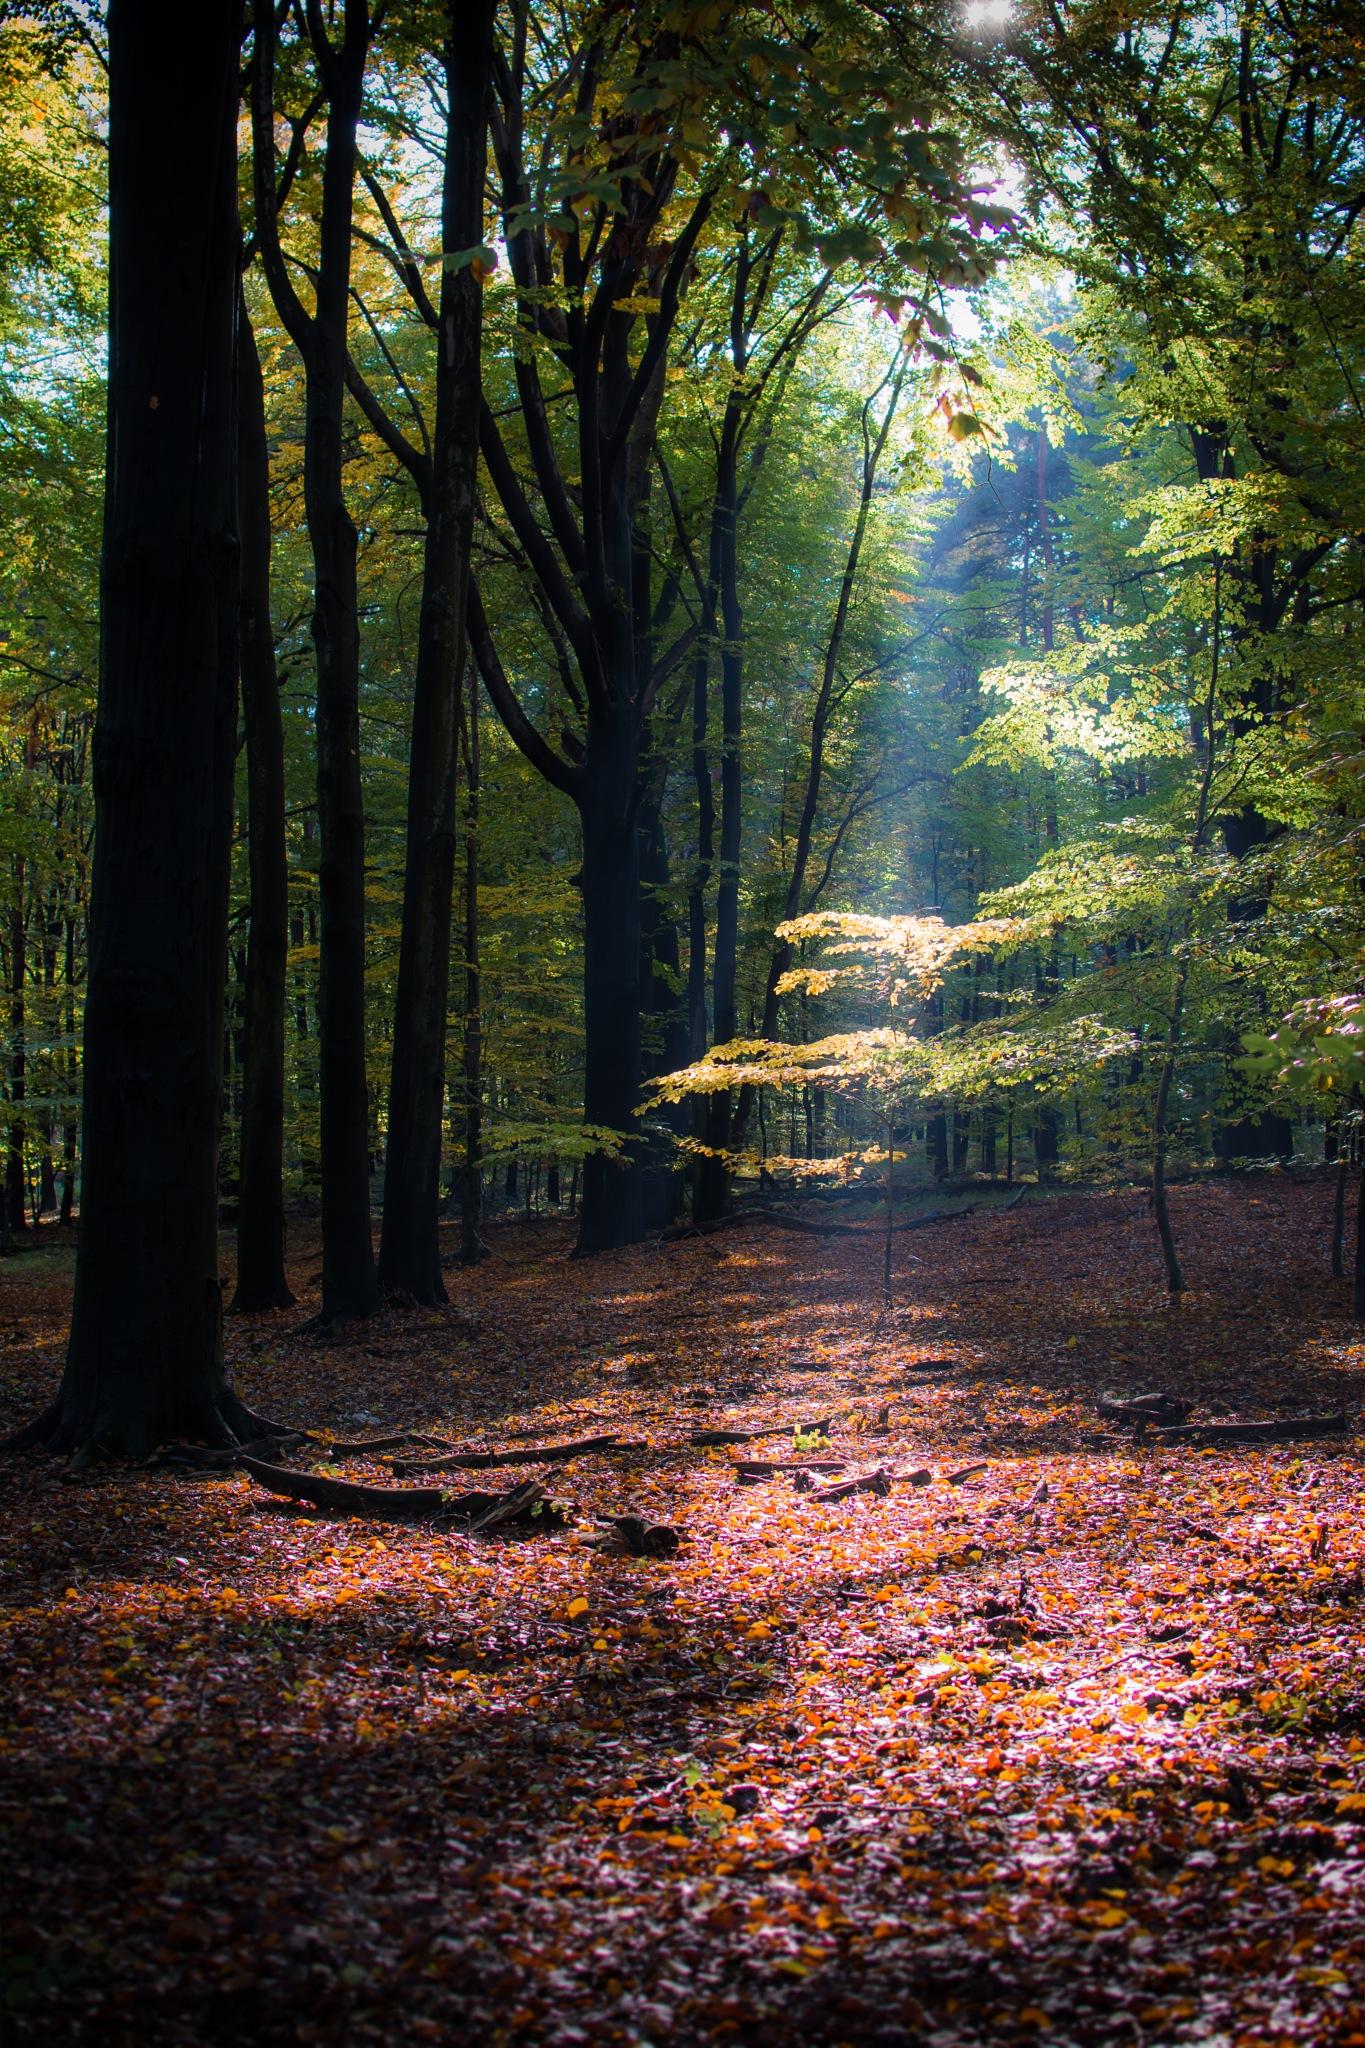 October by stoplamek